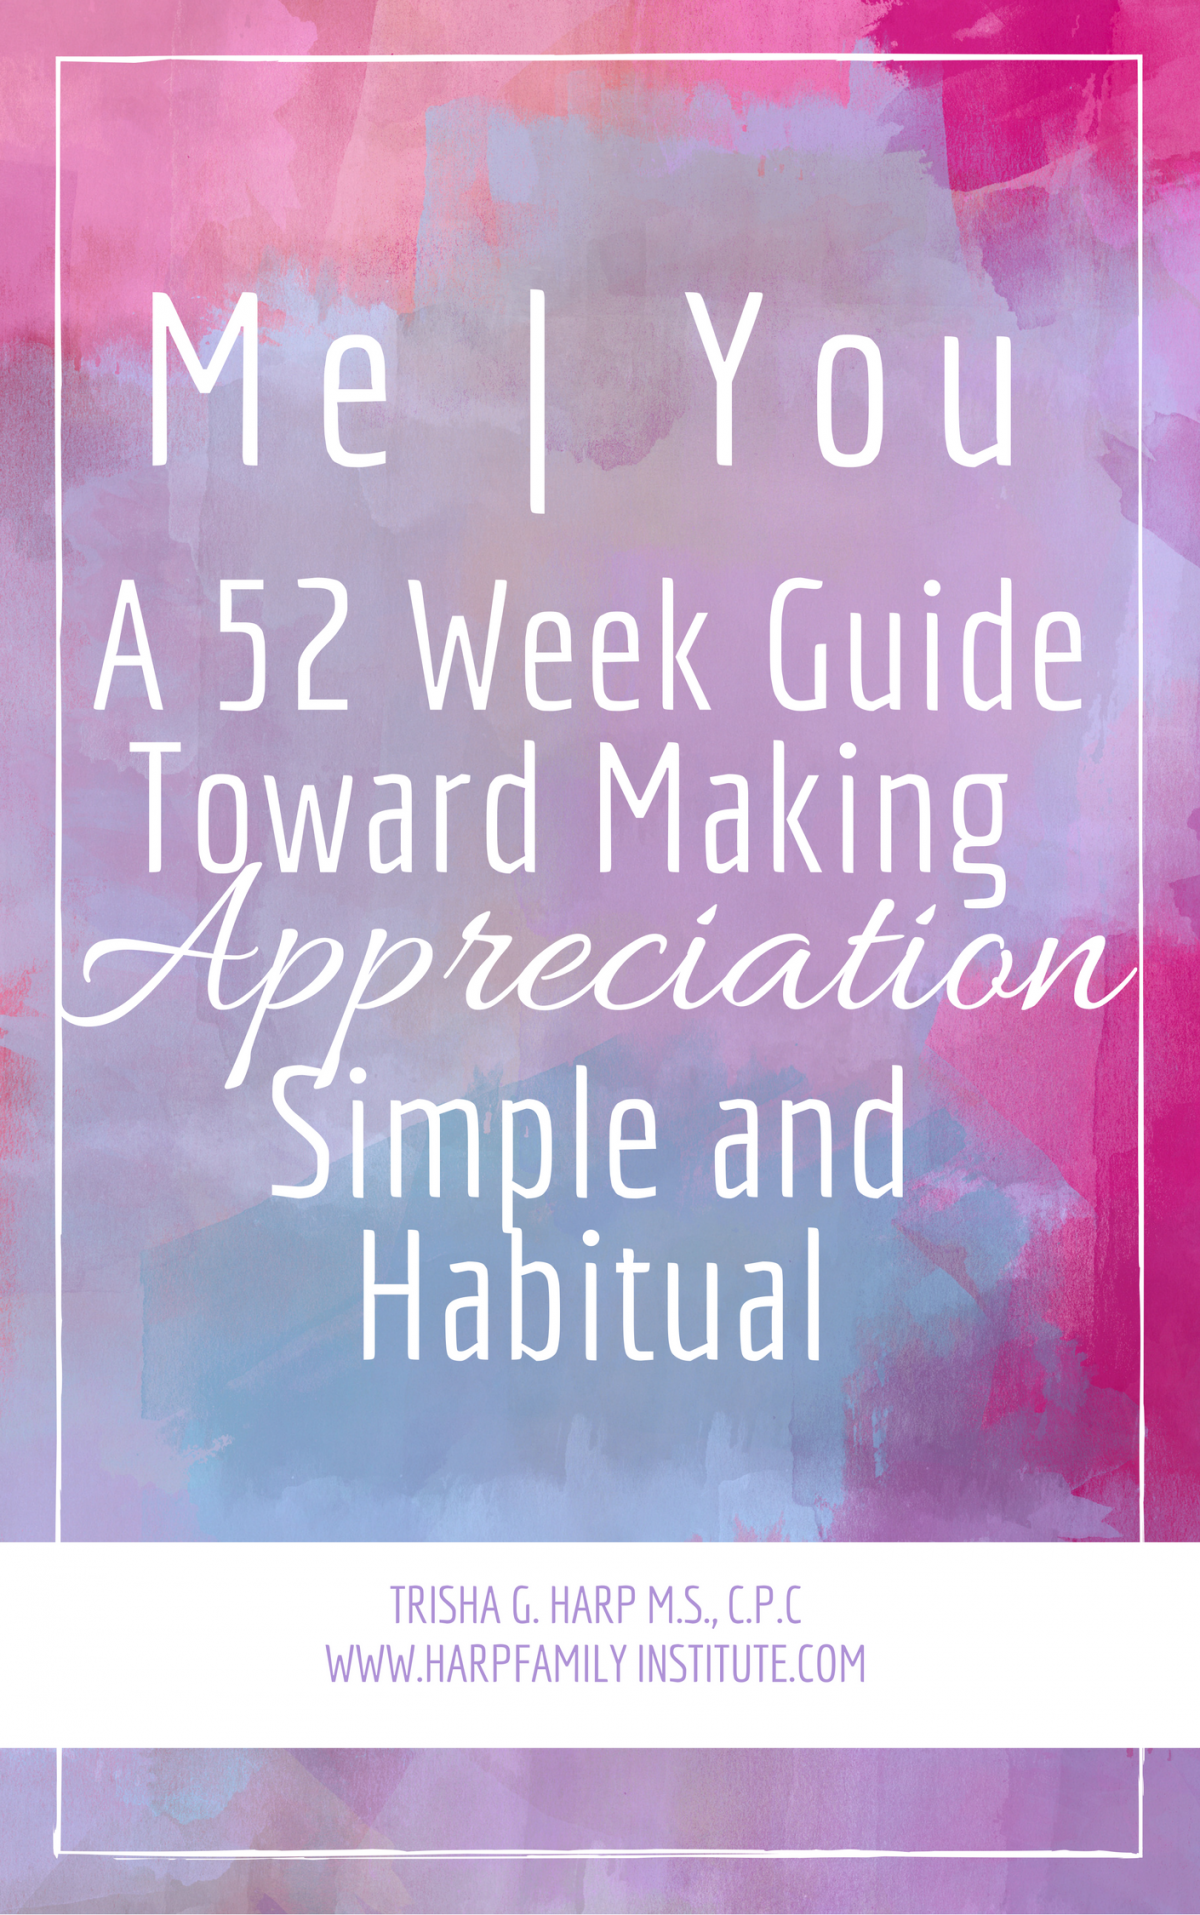 Me | You A 52 Week Guide Toward Making Appreciation Simple and Habitual